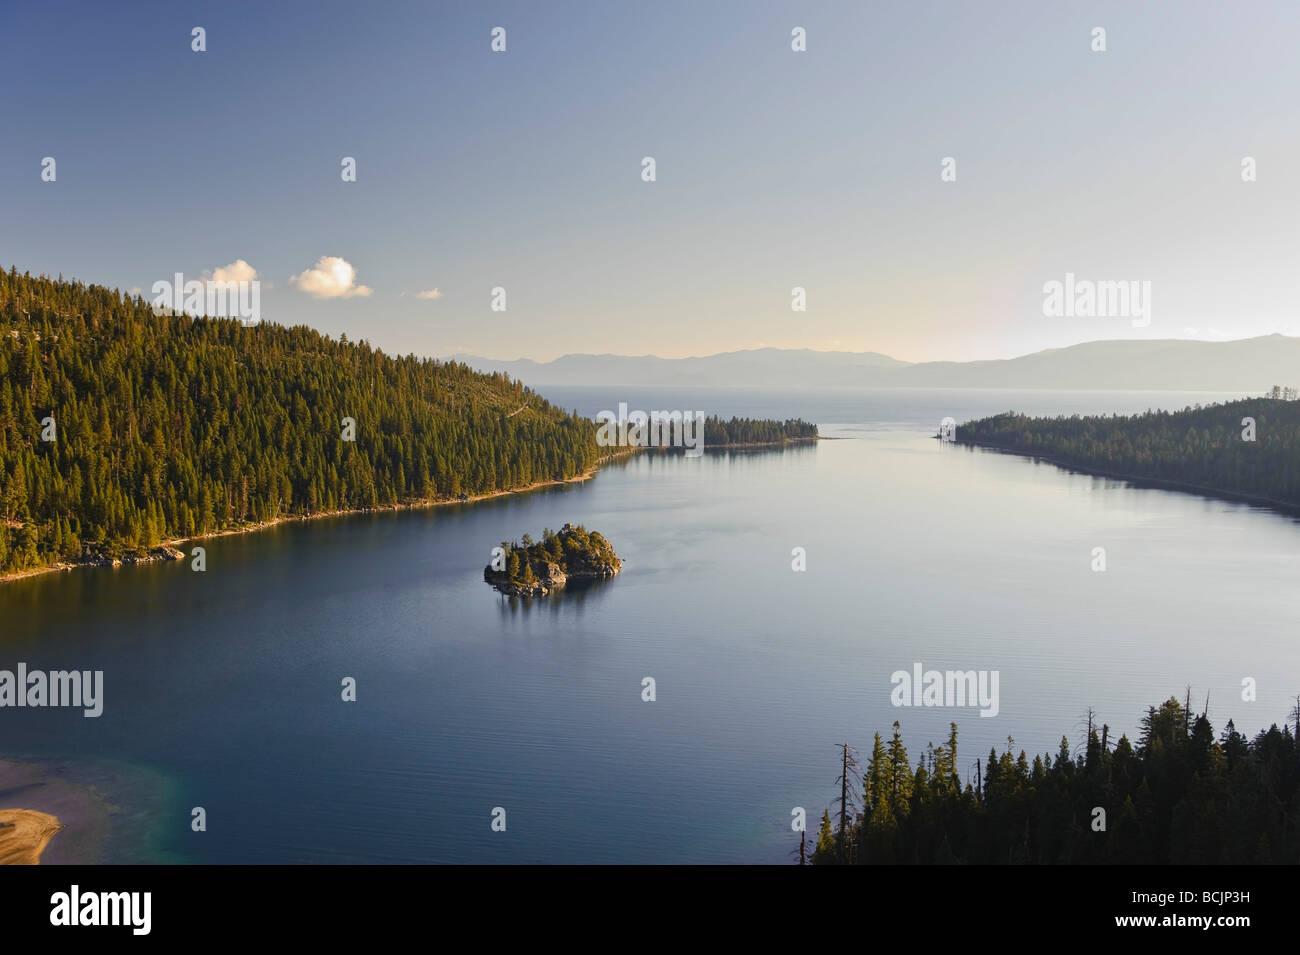 USA, California/Nevada, Lake Tahoe, Emerald Bay Stock Photo